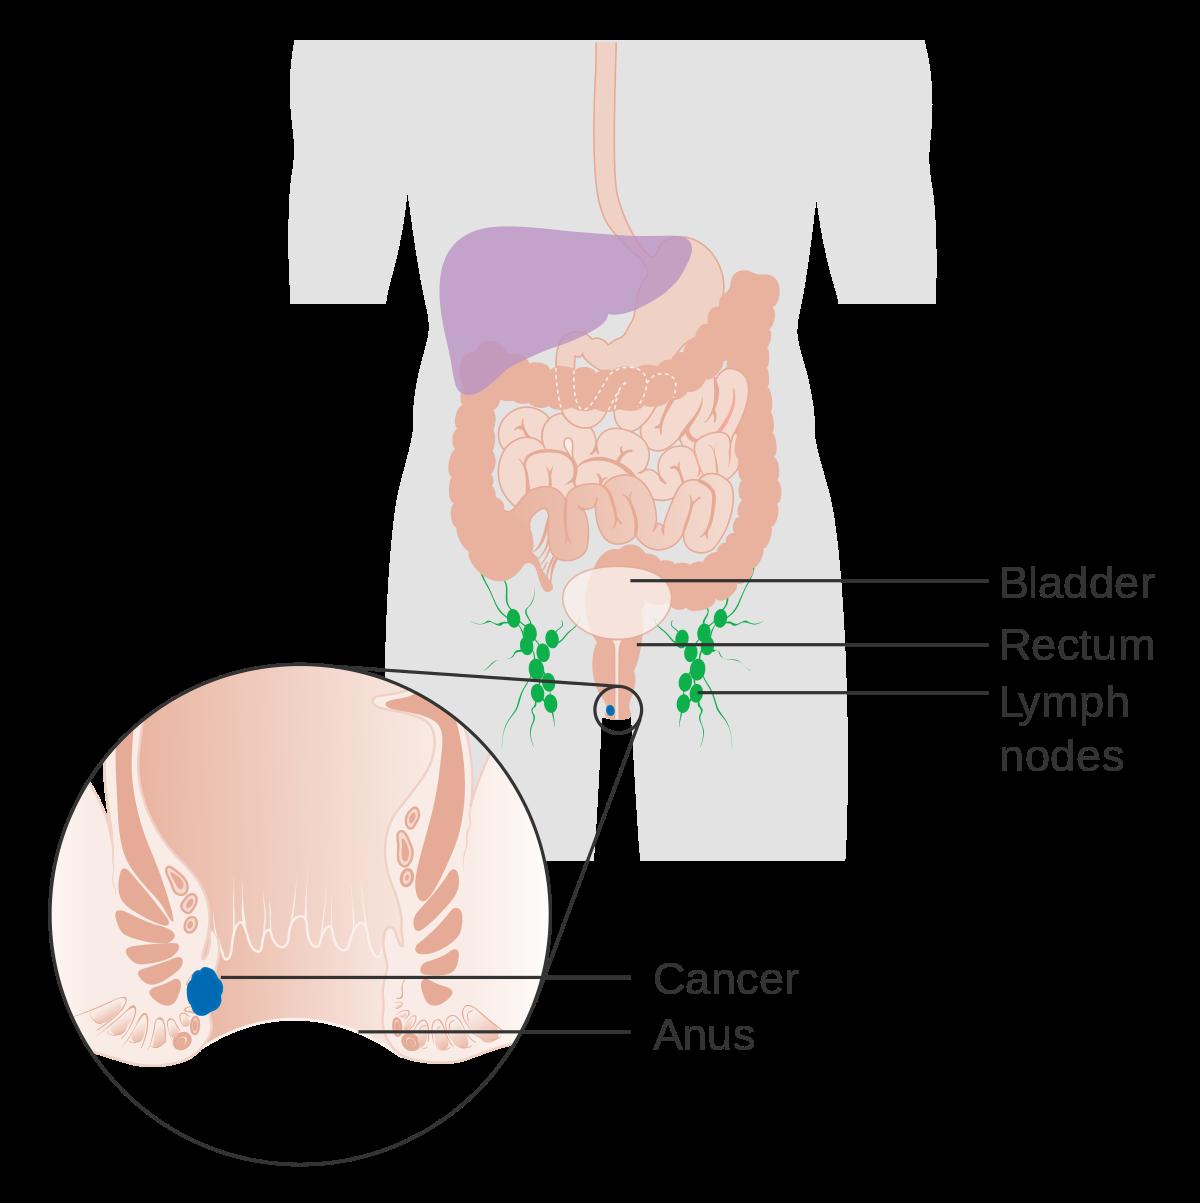 papilloma meaning in arabic morfologia teniei